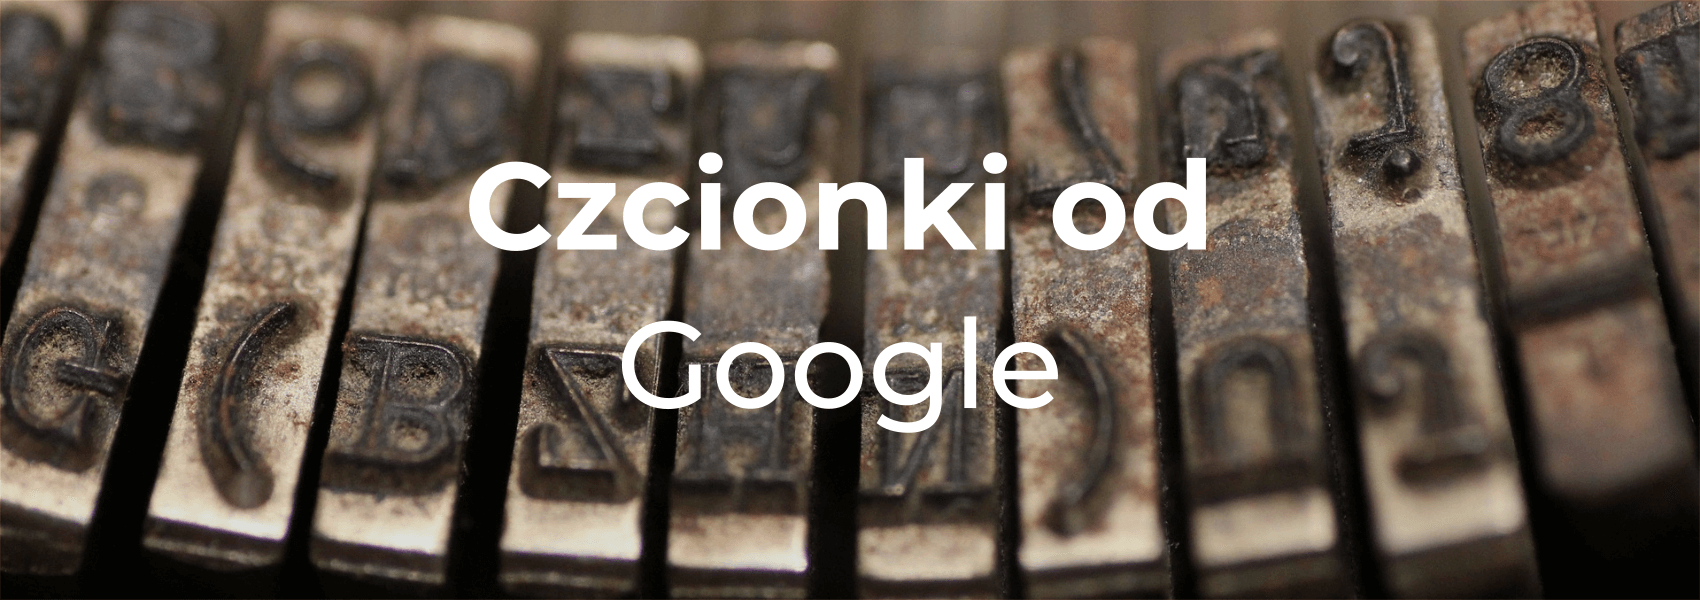 Czcionki od Google